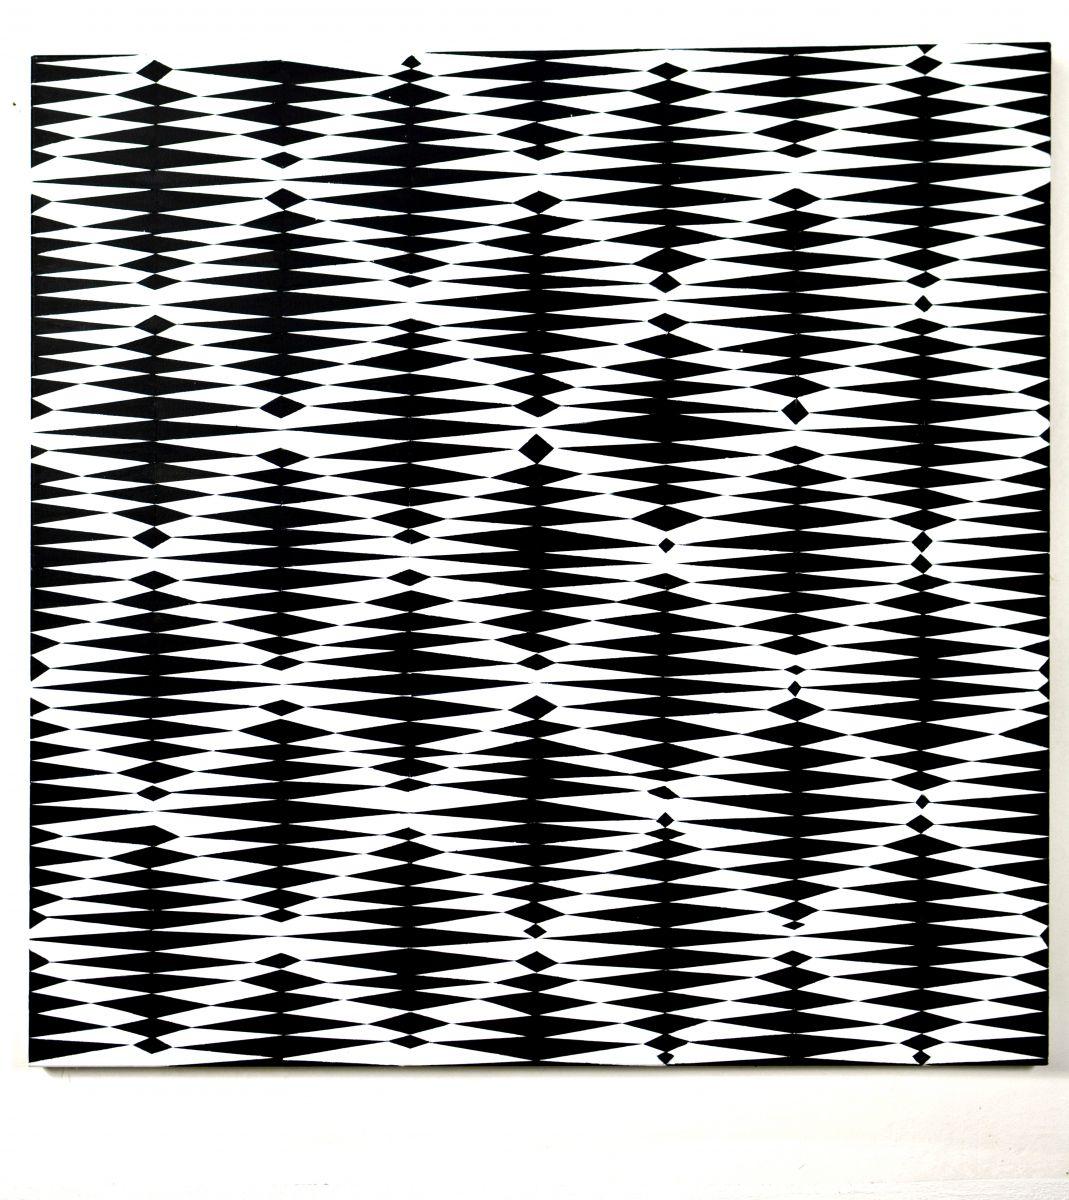 Perception-studio illmitz-black and white-painting